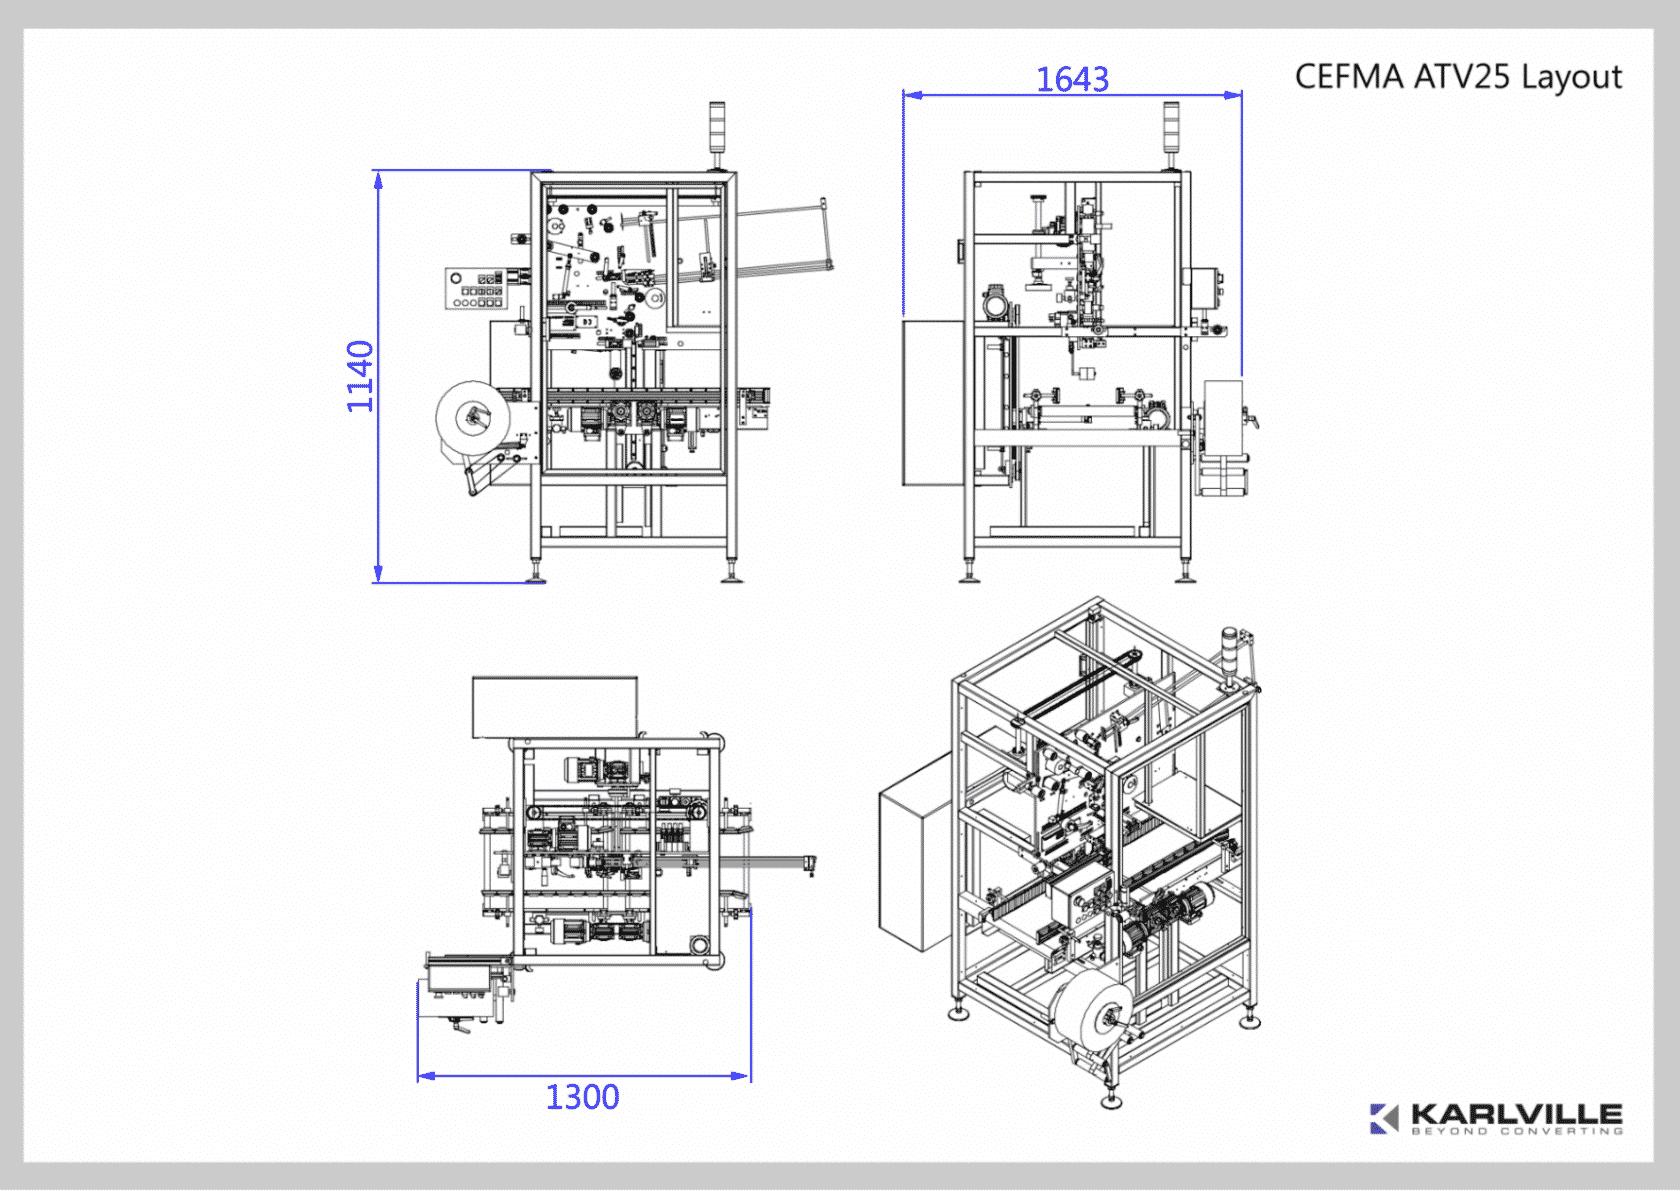 ATV25-1.png (4856×3442)